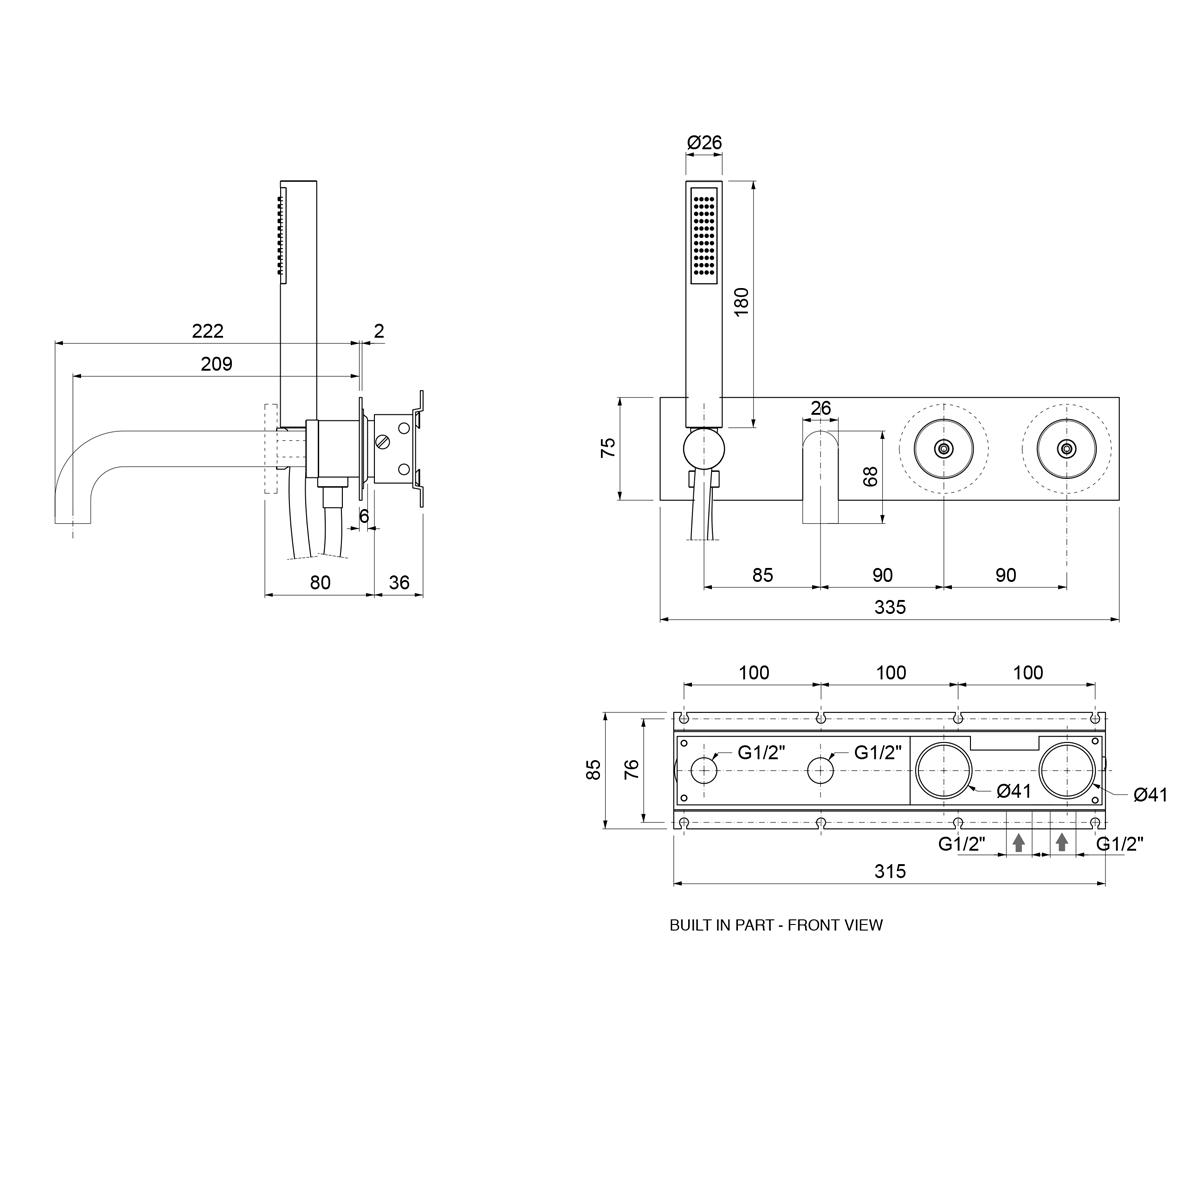 22509 Technical